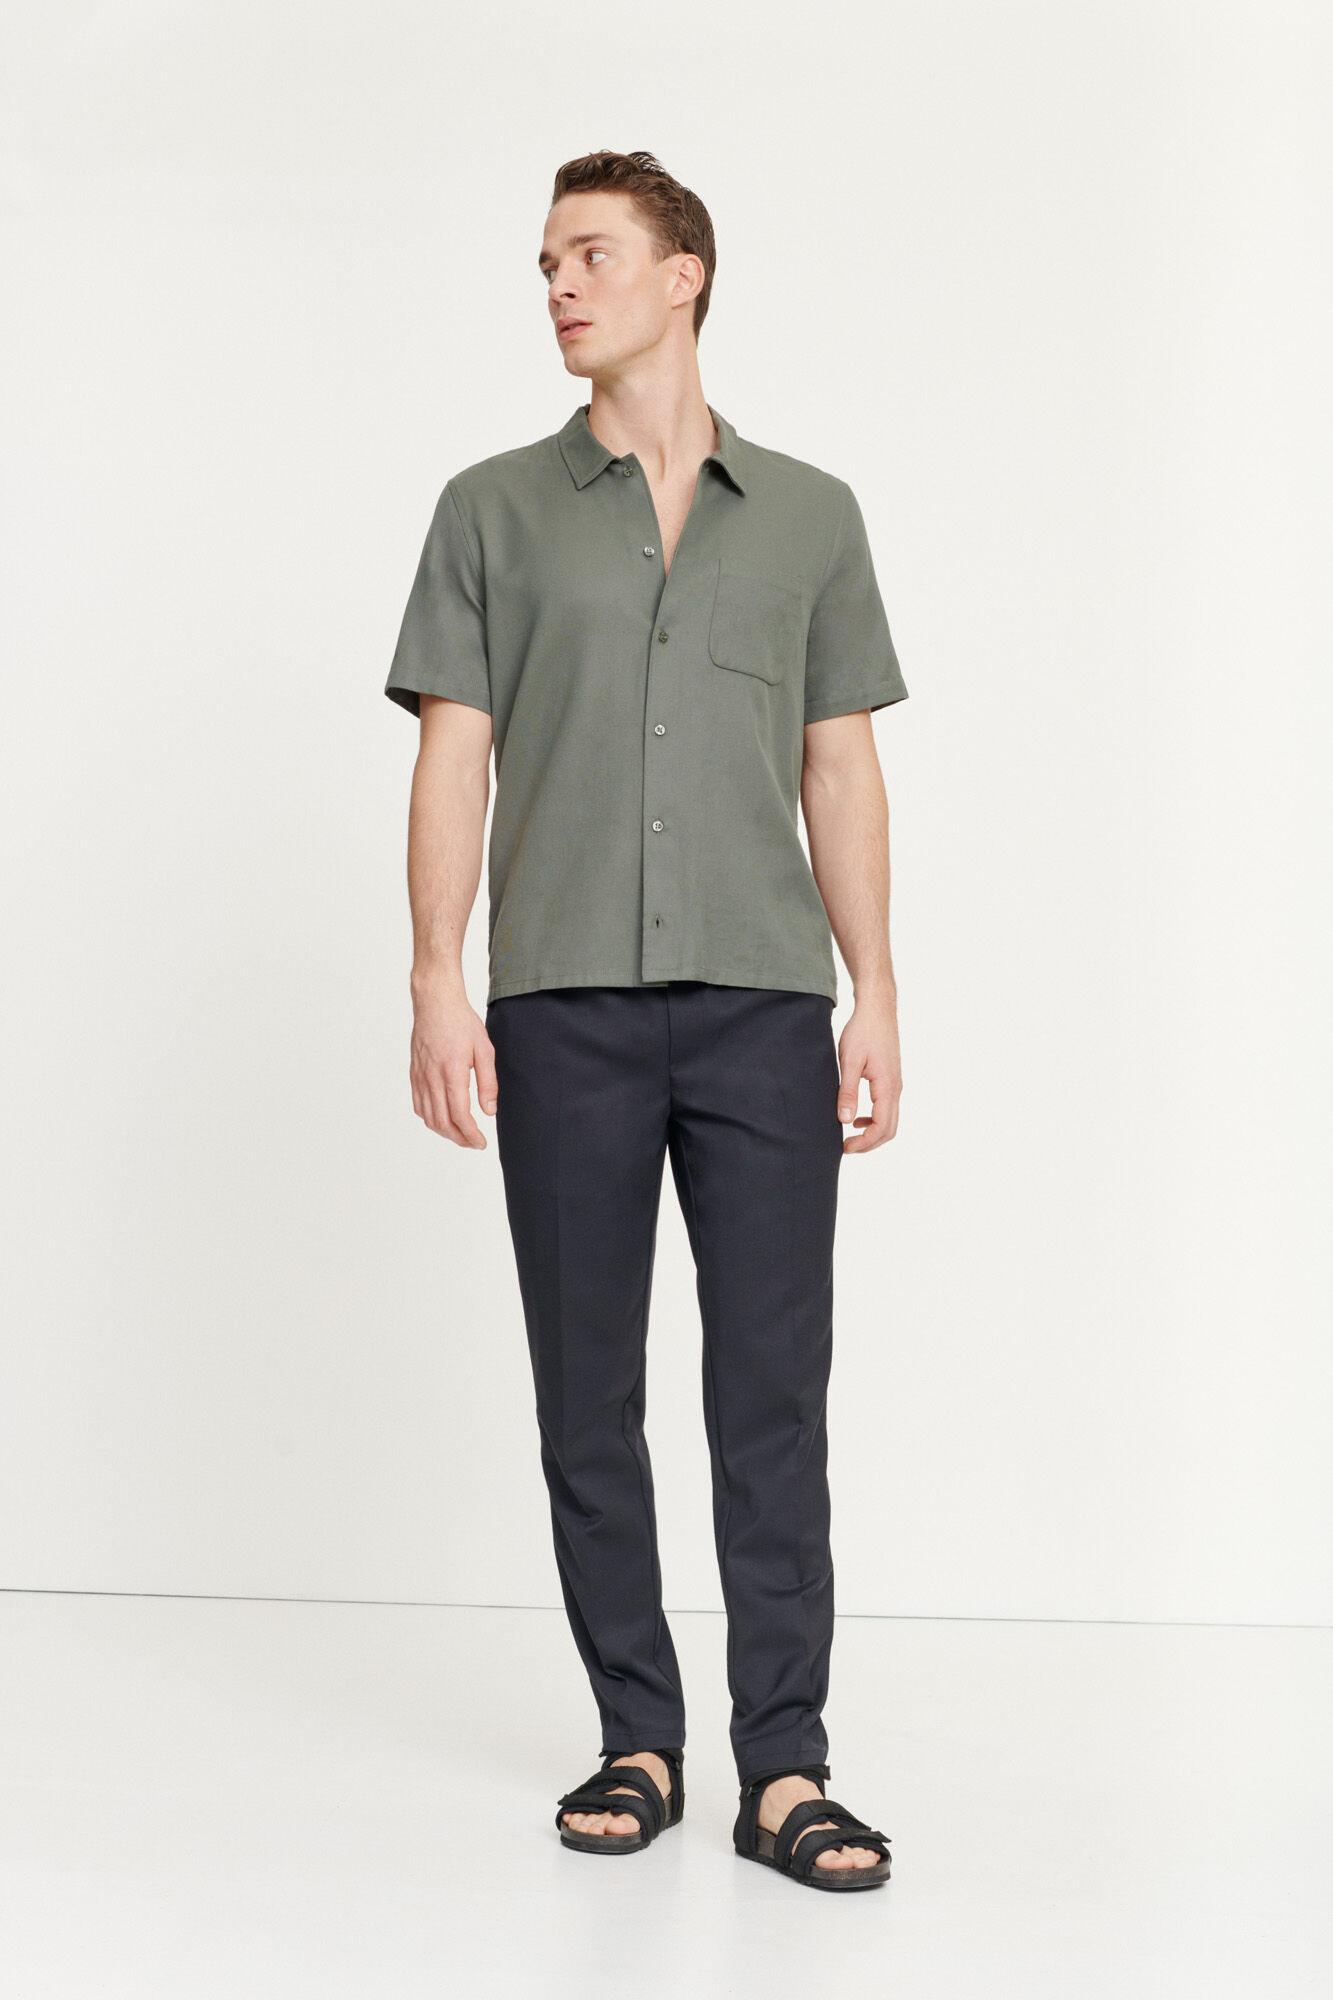 Avan JF shirt 11018, THYME